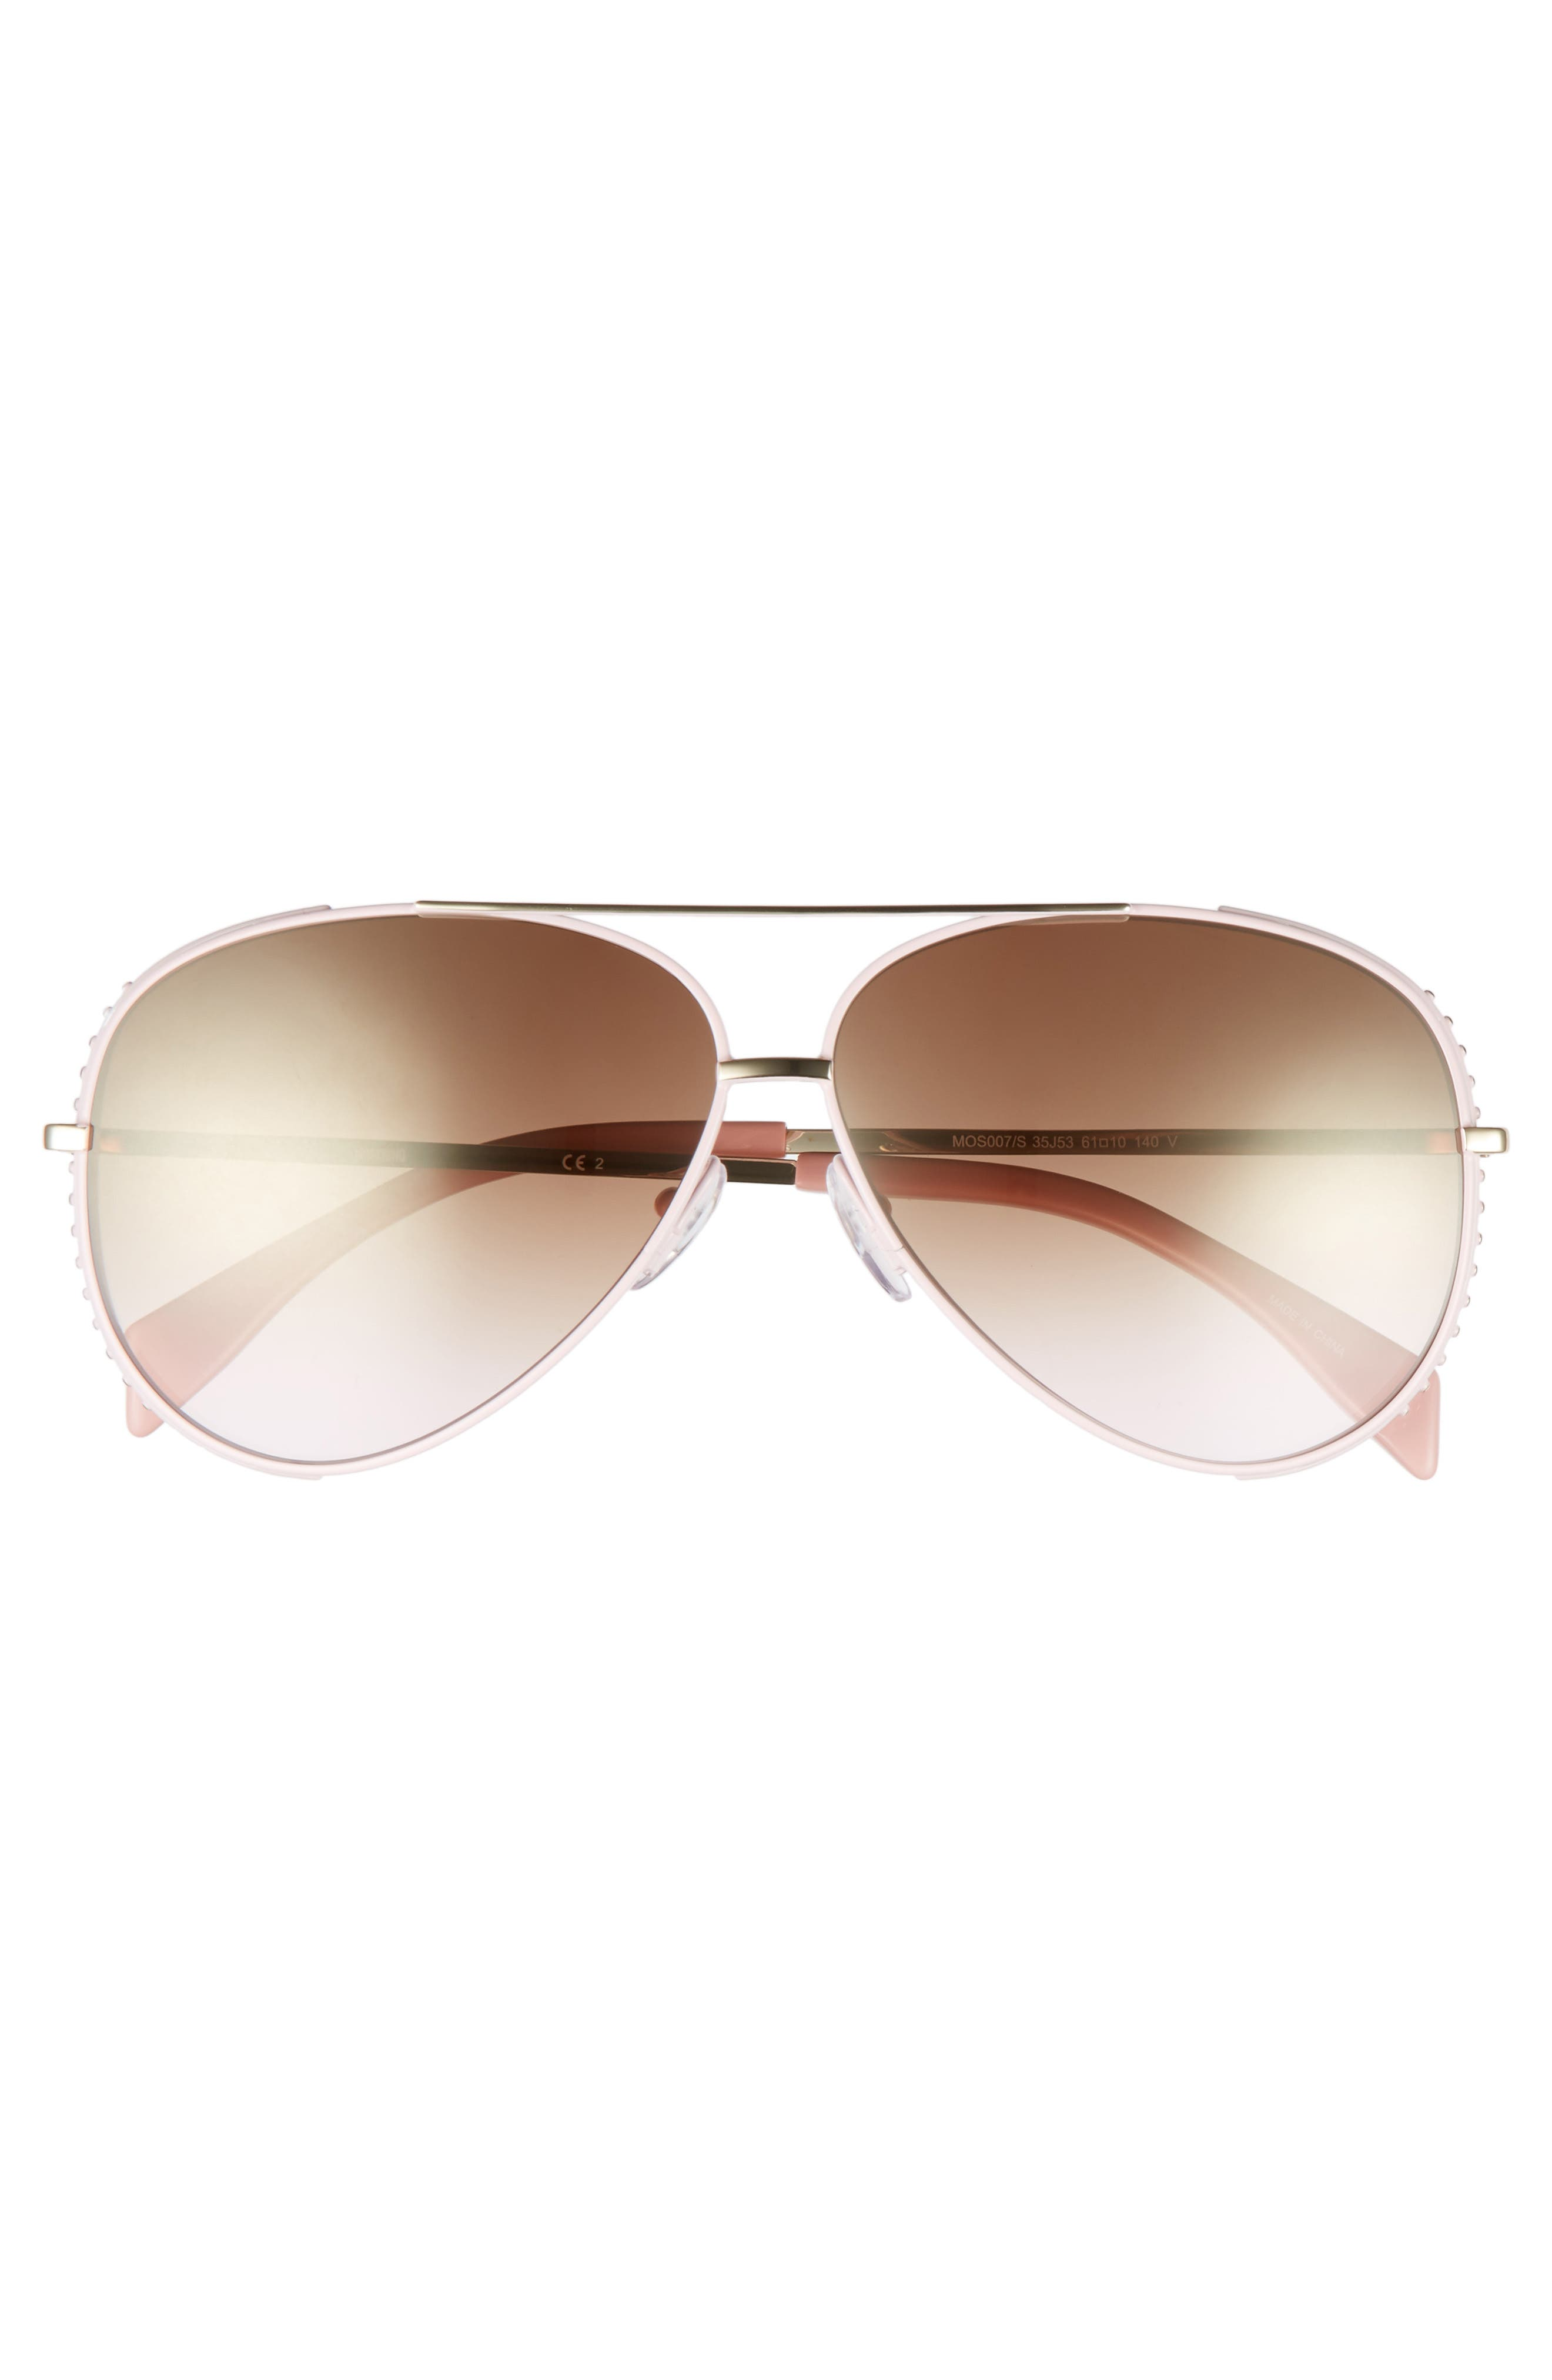 61mm Metal Aviator Sunglasses,                             Alternate thumbnail 3, color,                             Pink